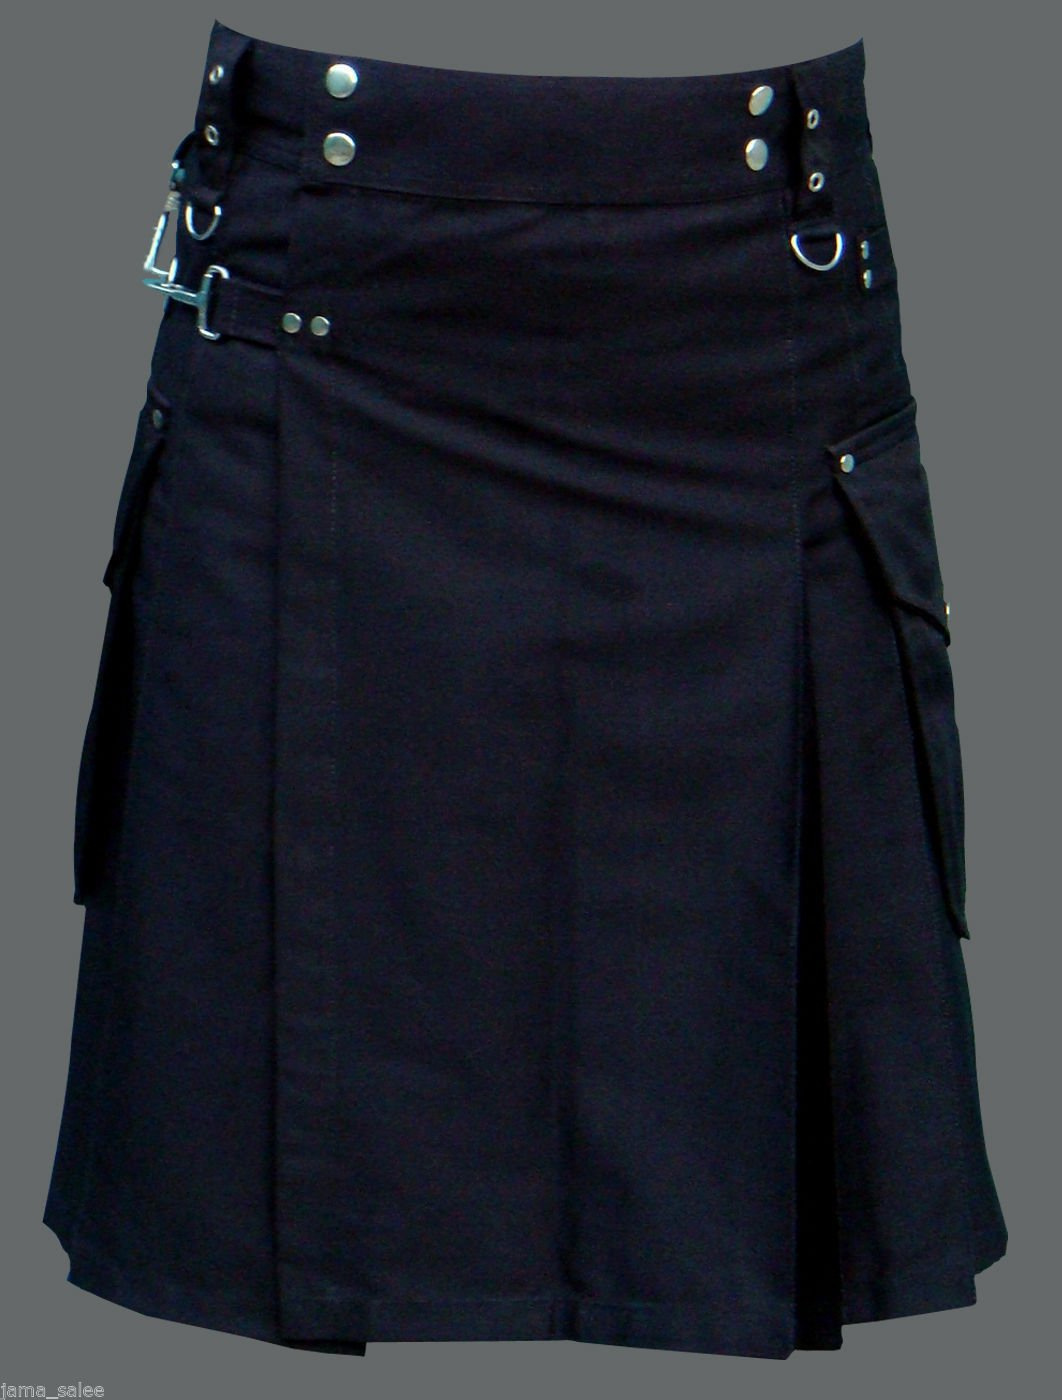 Men 38 Waist Handmade Black Deluxe Utility Kilt 100% Cotton With Cargo Pockets